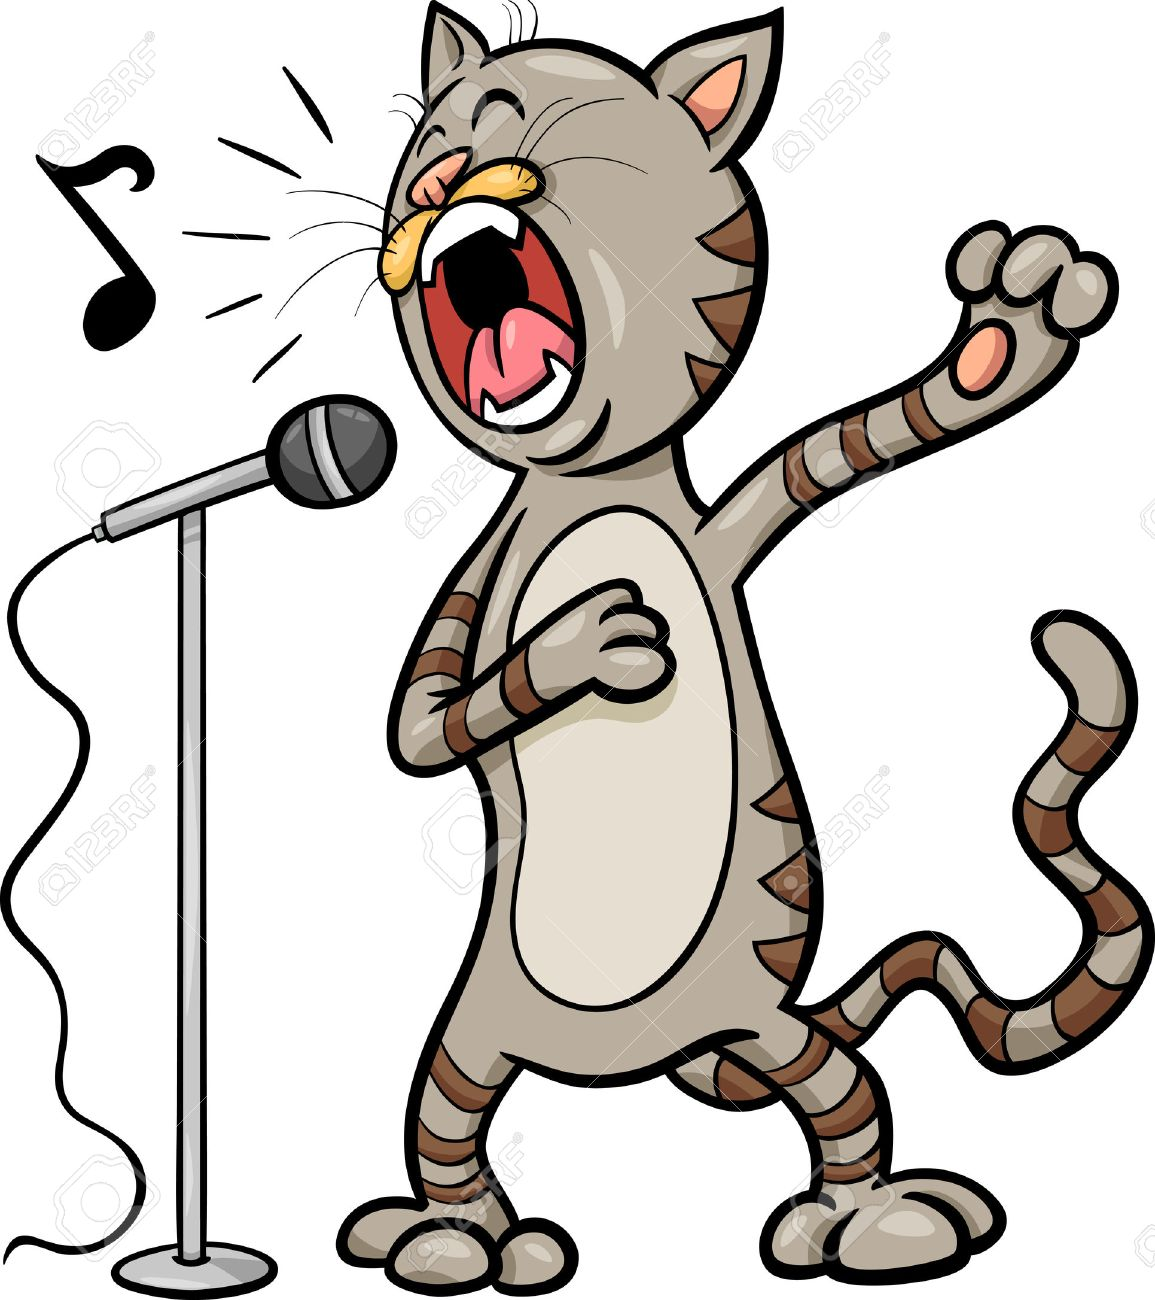 cartoon illustration of funny singing cat character royalty free rh 123rf com funny kitty clipart funny cat clip art for bathroom